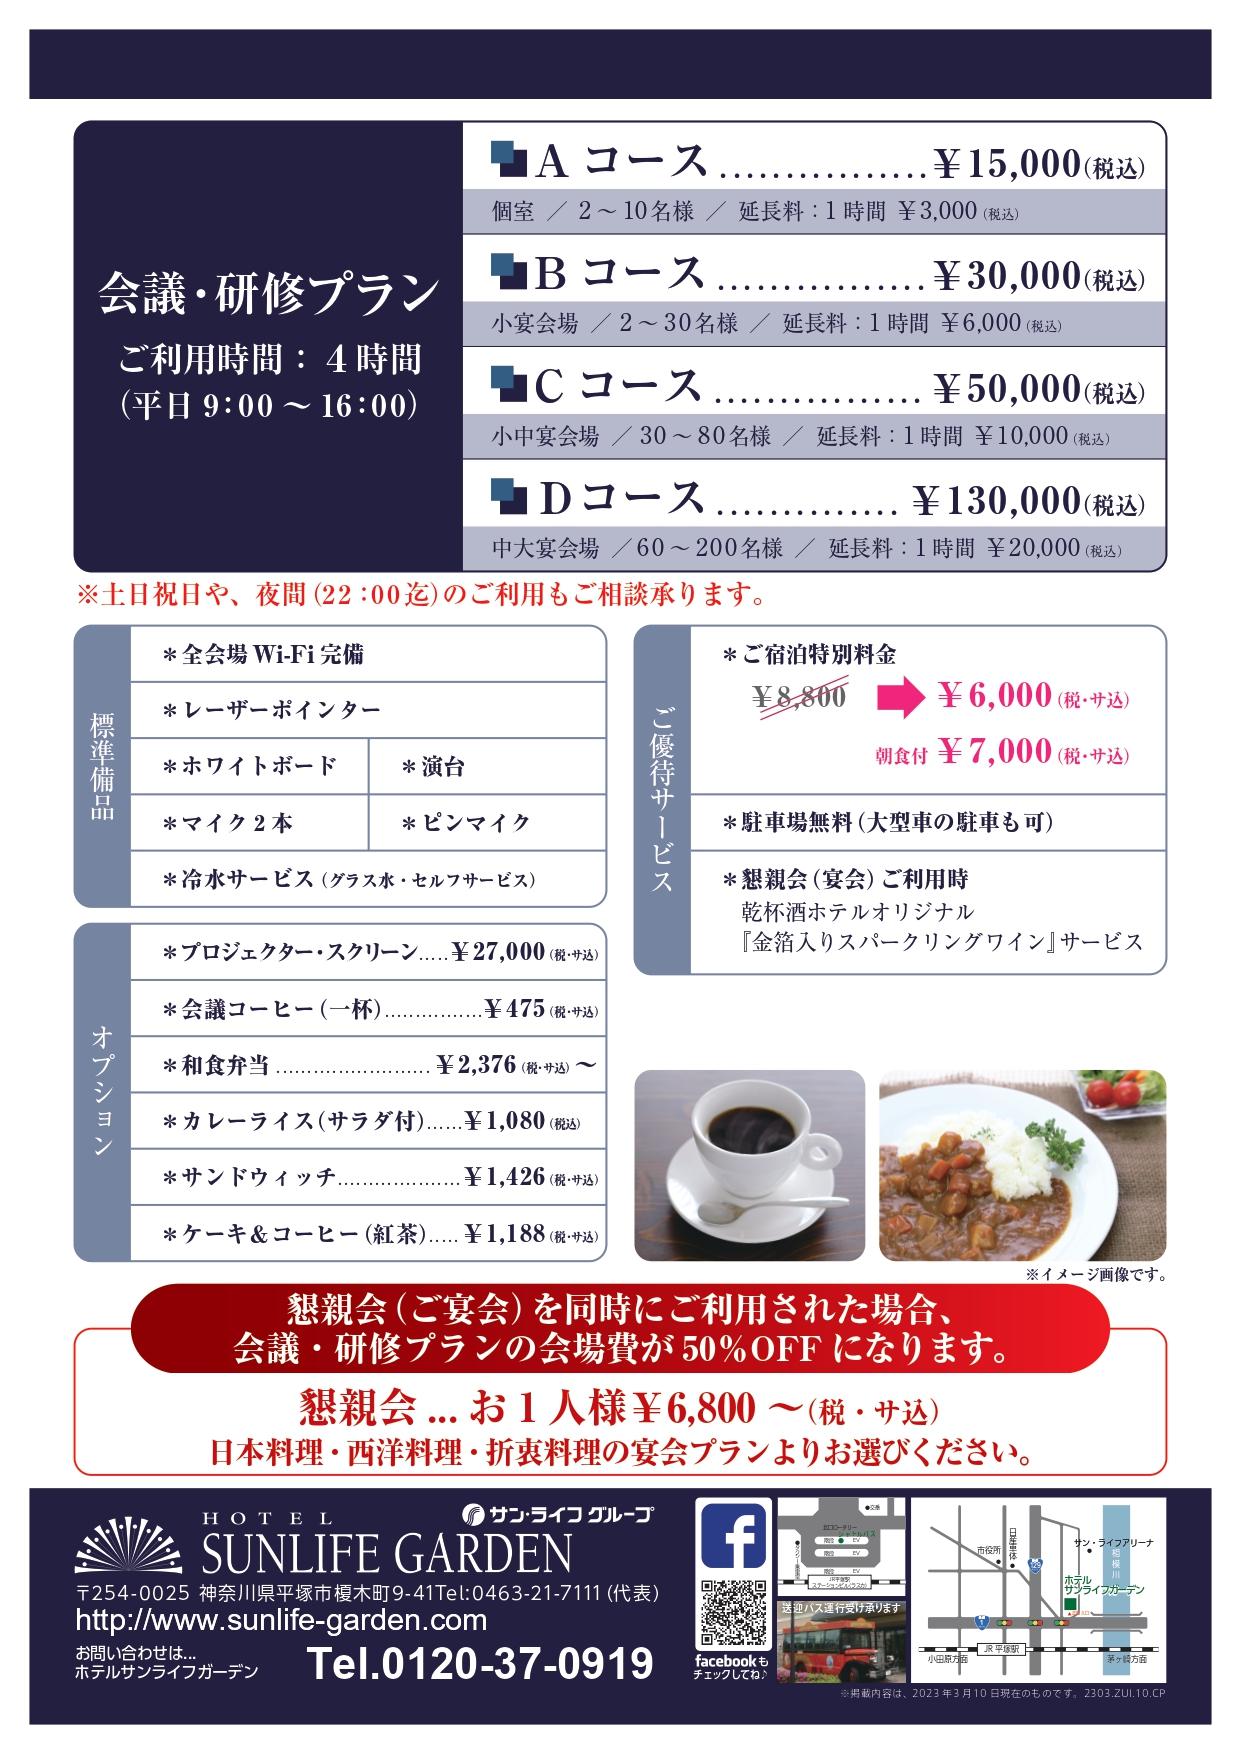 hiratuka-cof2.jpg